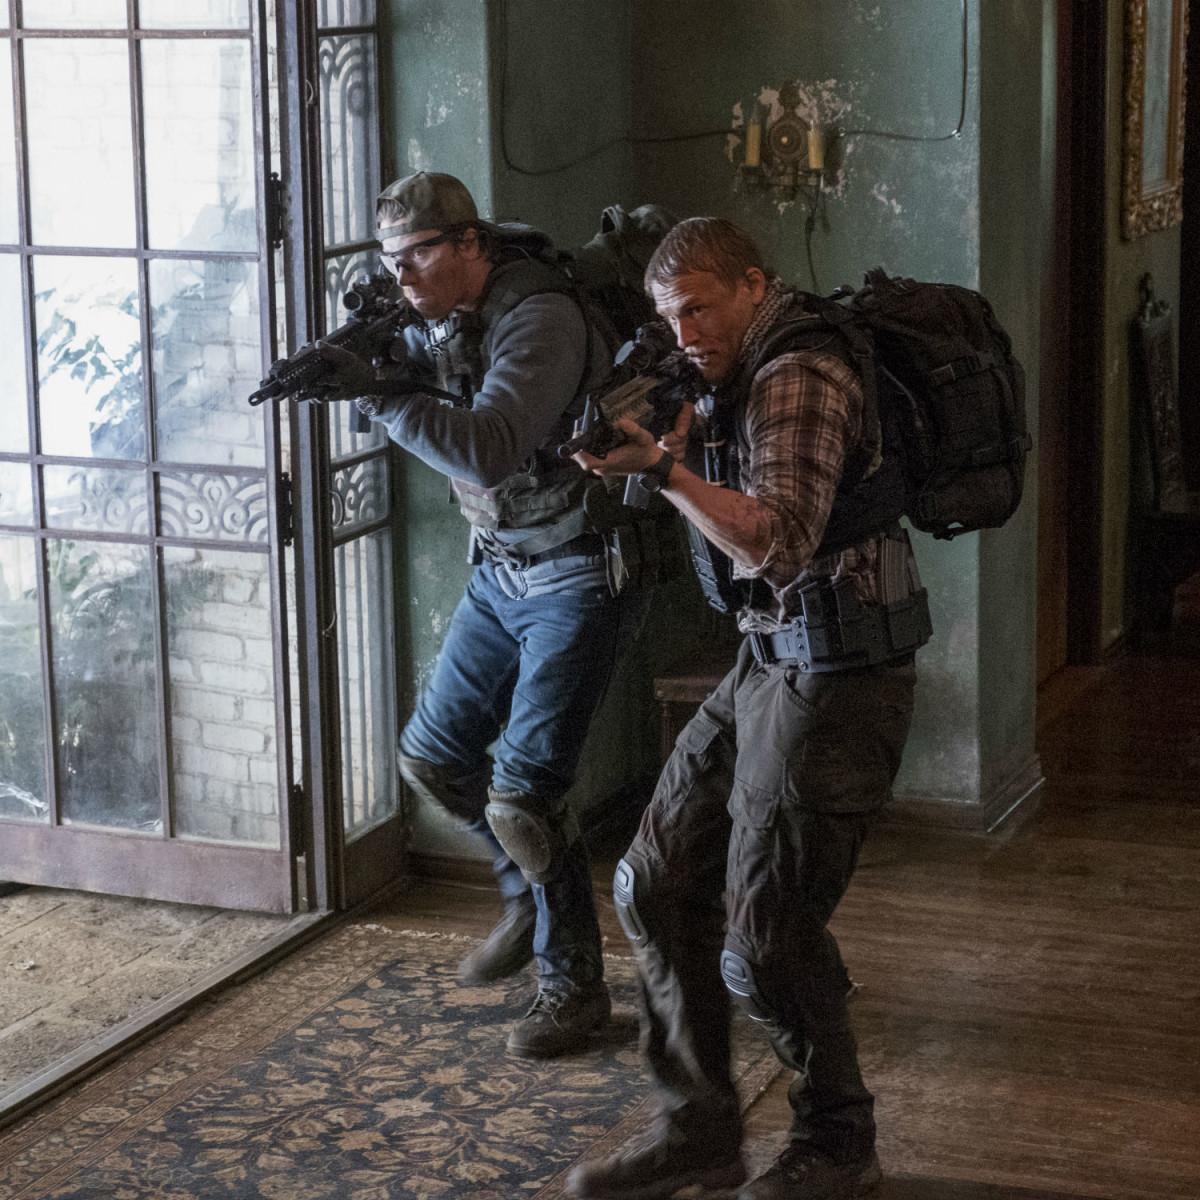 Garrett Hedlund and Charlie Hunnam in Triple Frontier